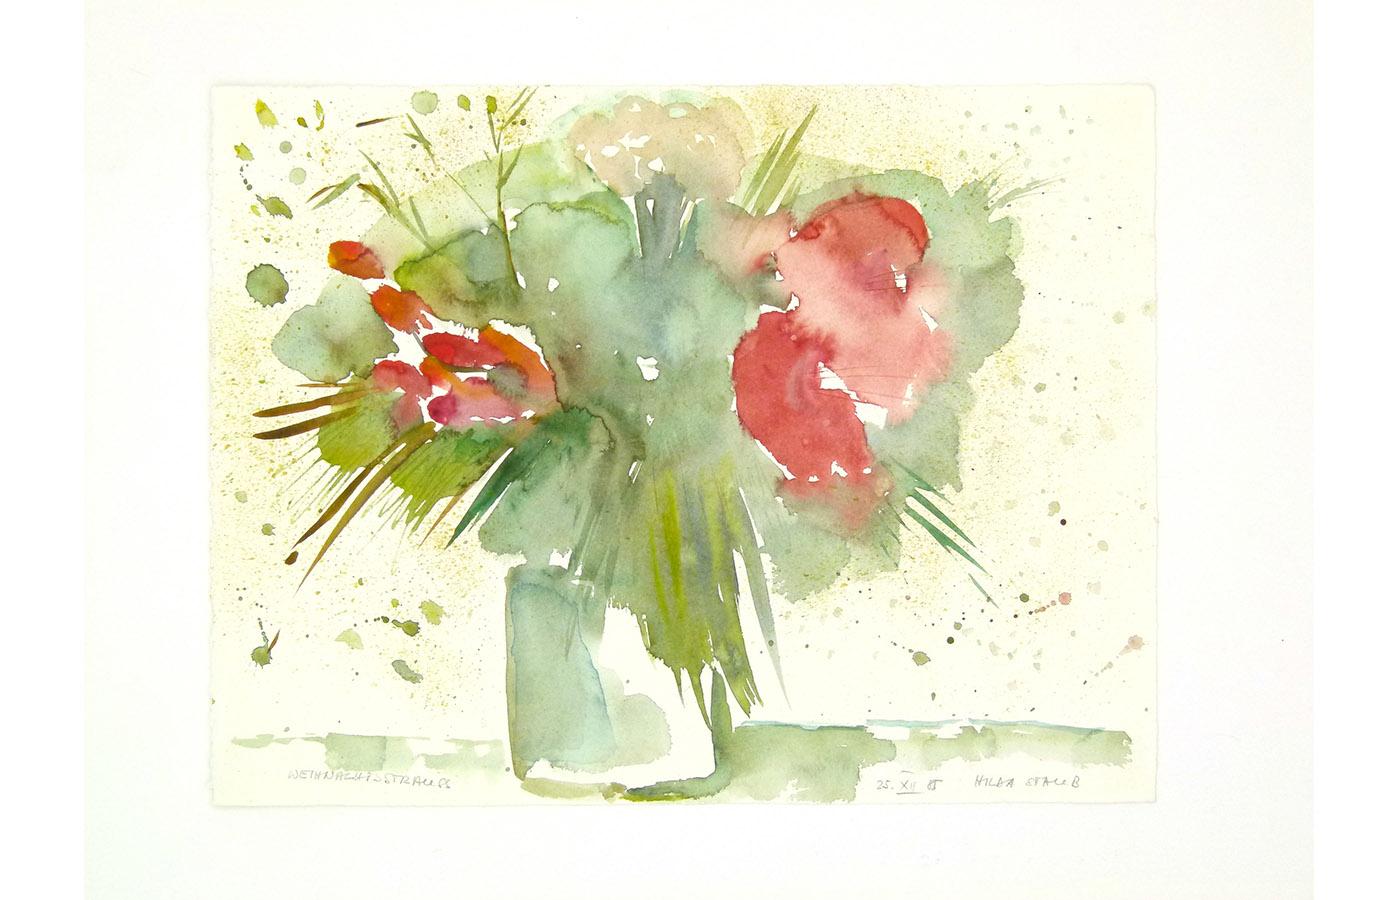 Blumen_0054_L1100370a